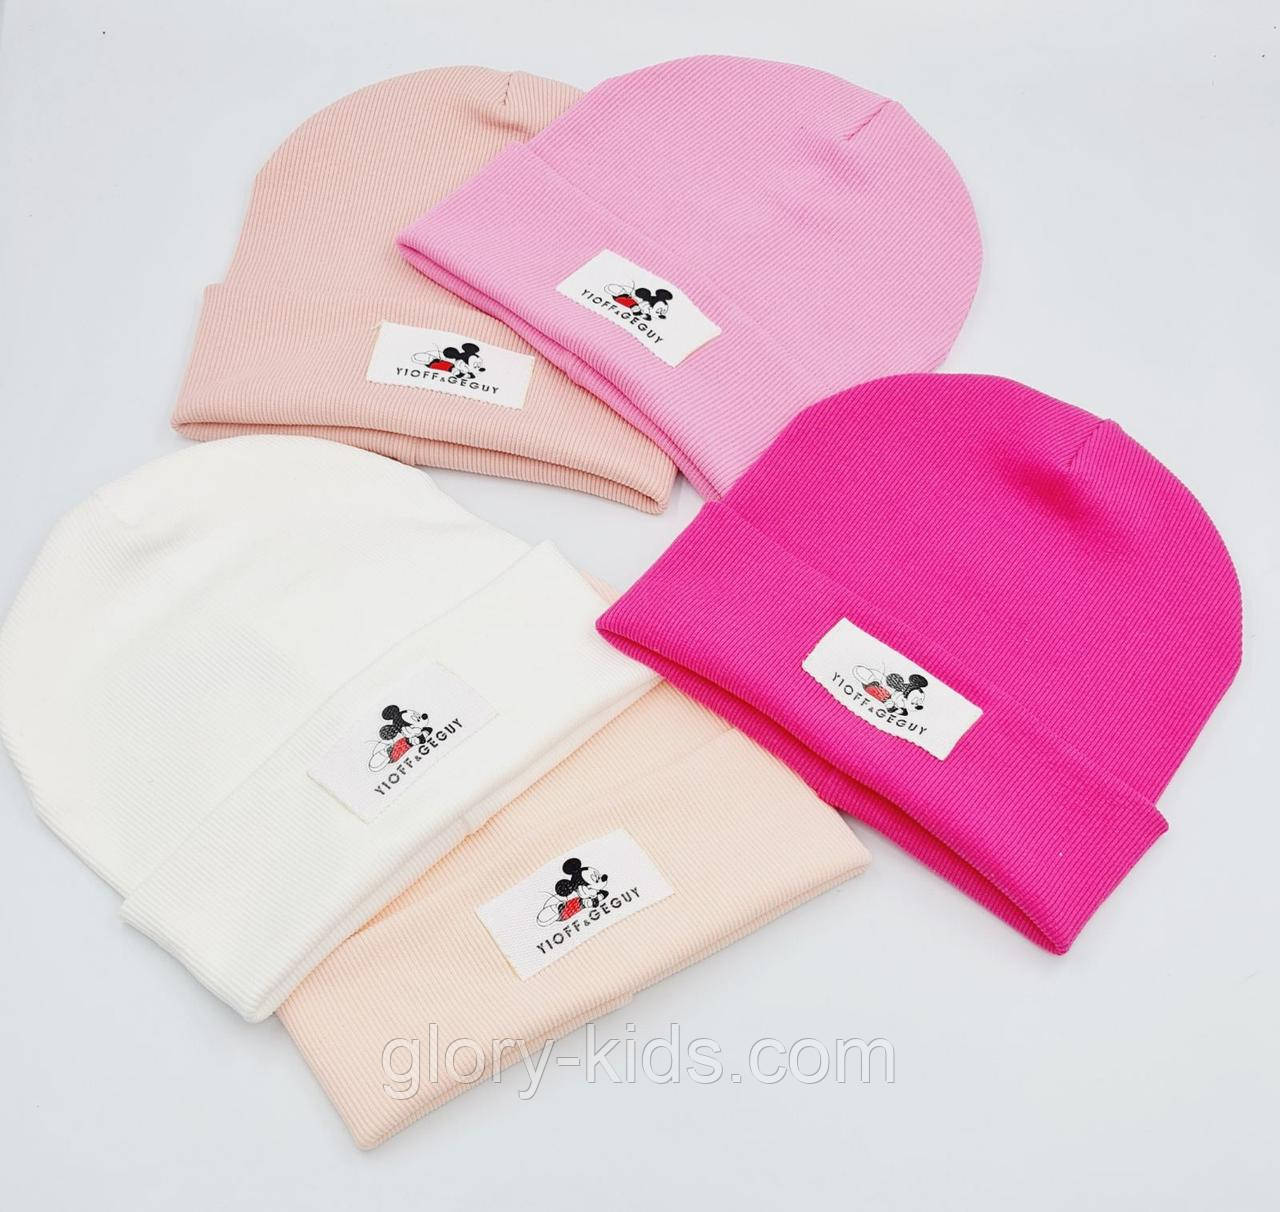 Трикотажна подвійна шапка р50-52 код1055 Glory-kids